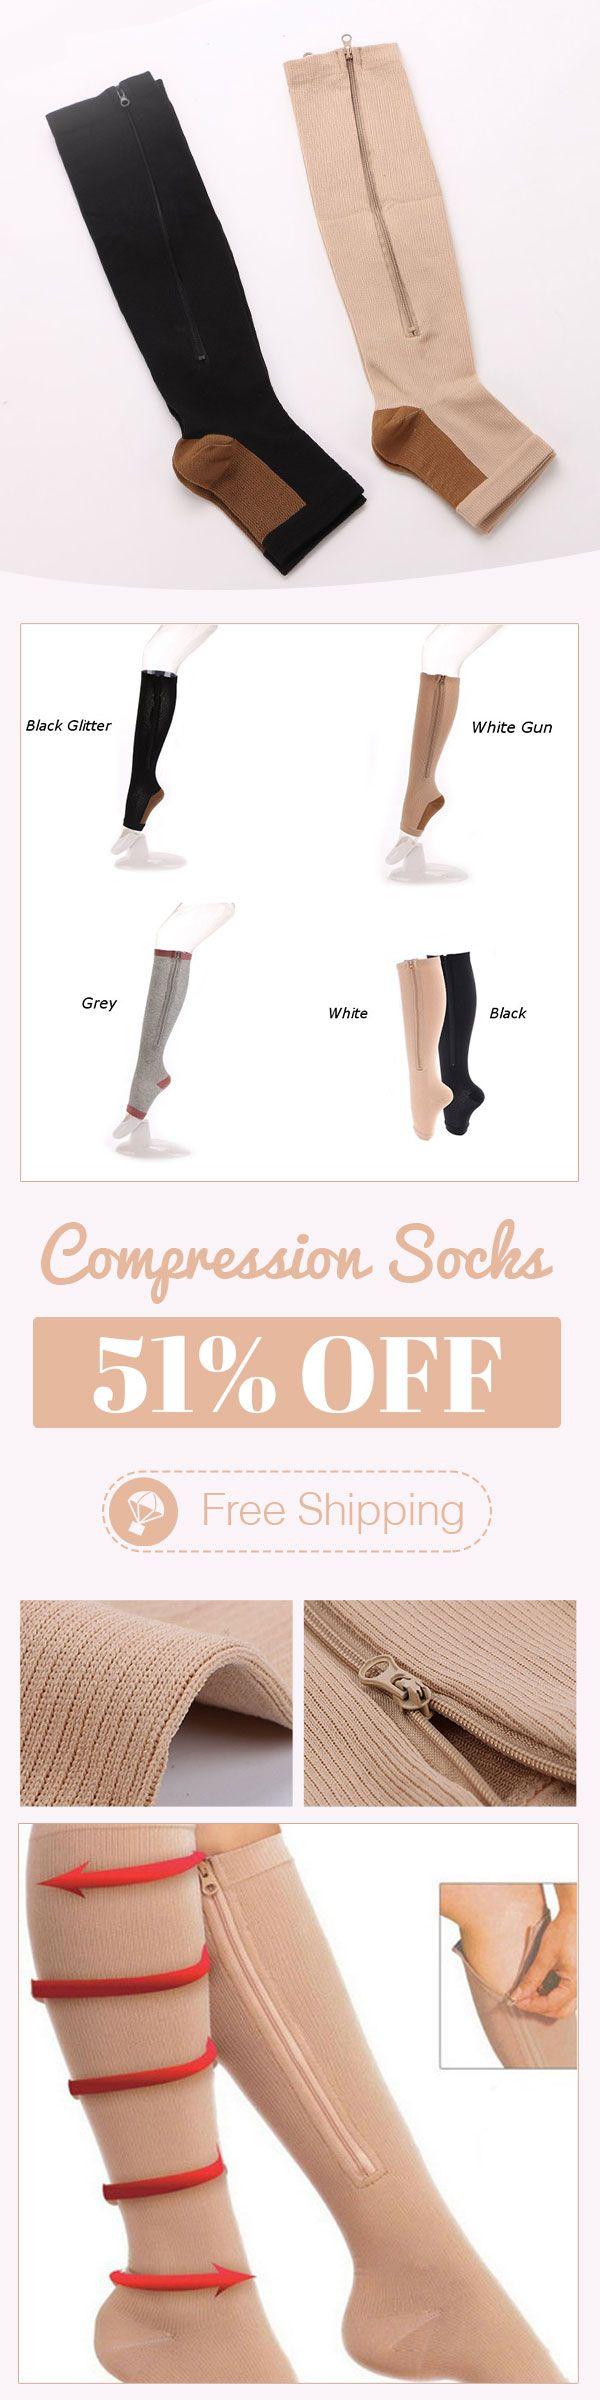 Durable Soothe Varicose Veins Compression Socks Stocking Sleep Leg Slimming